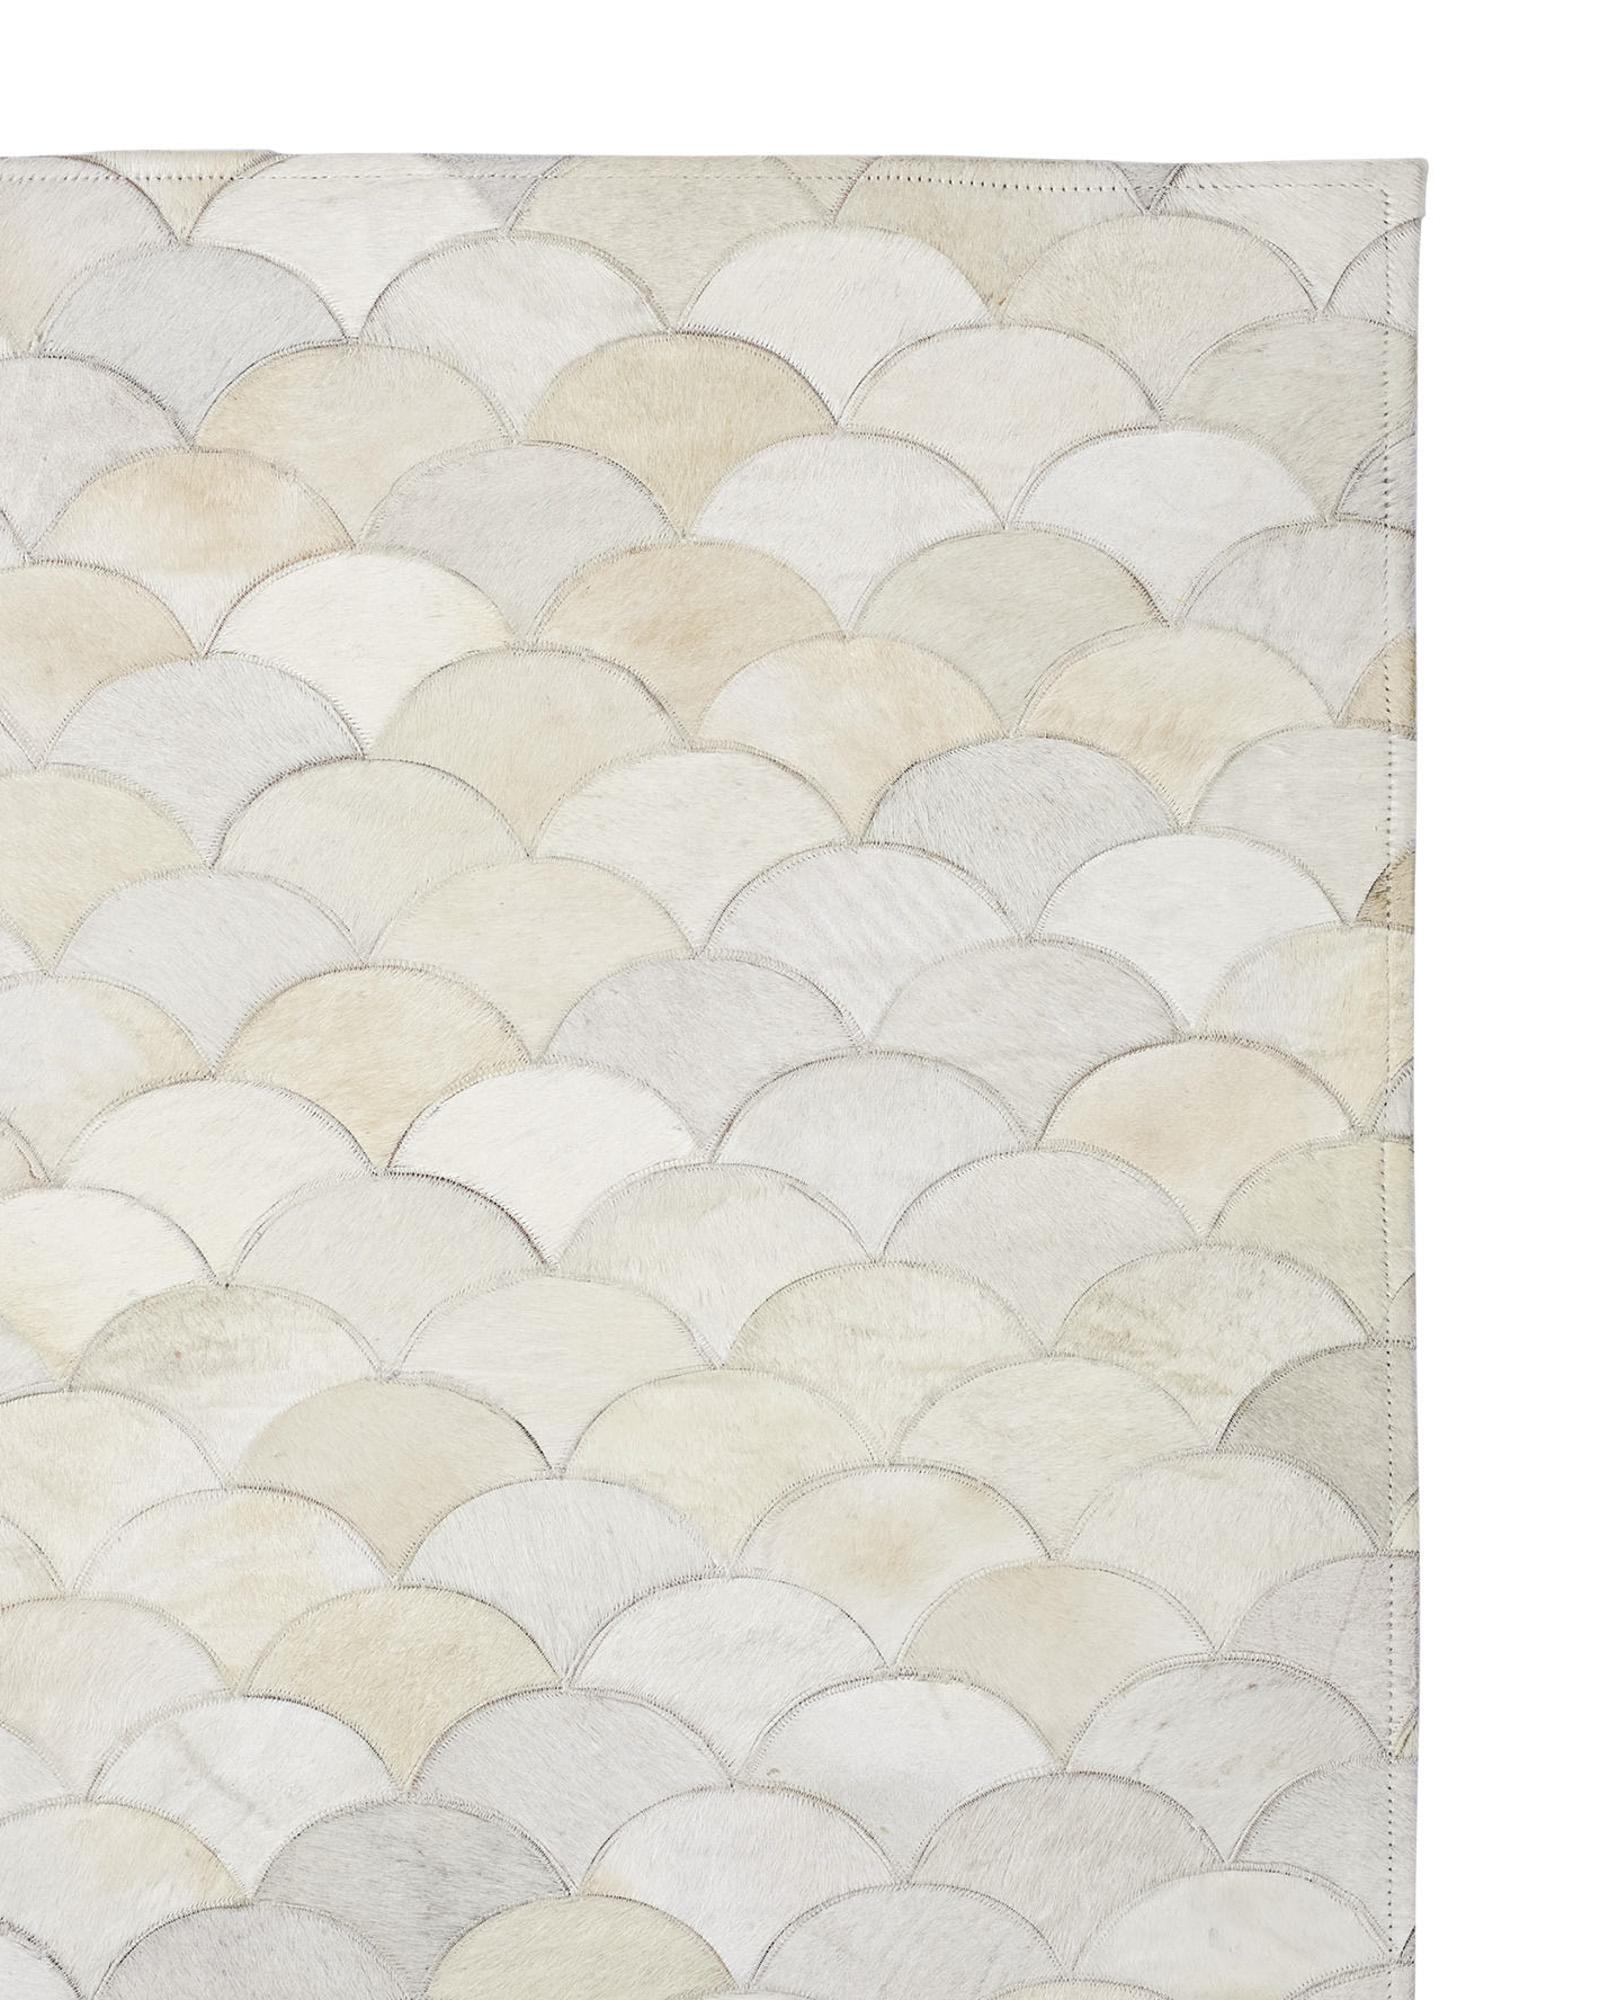 rugs reviews pure patchwork area metallic light cowhide hide rug park brindle